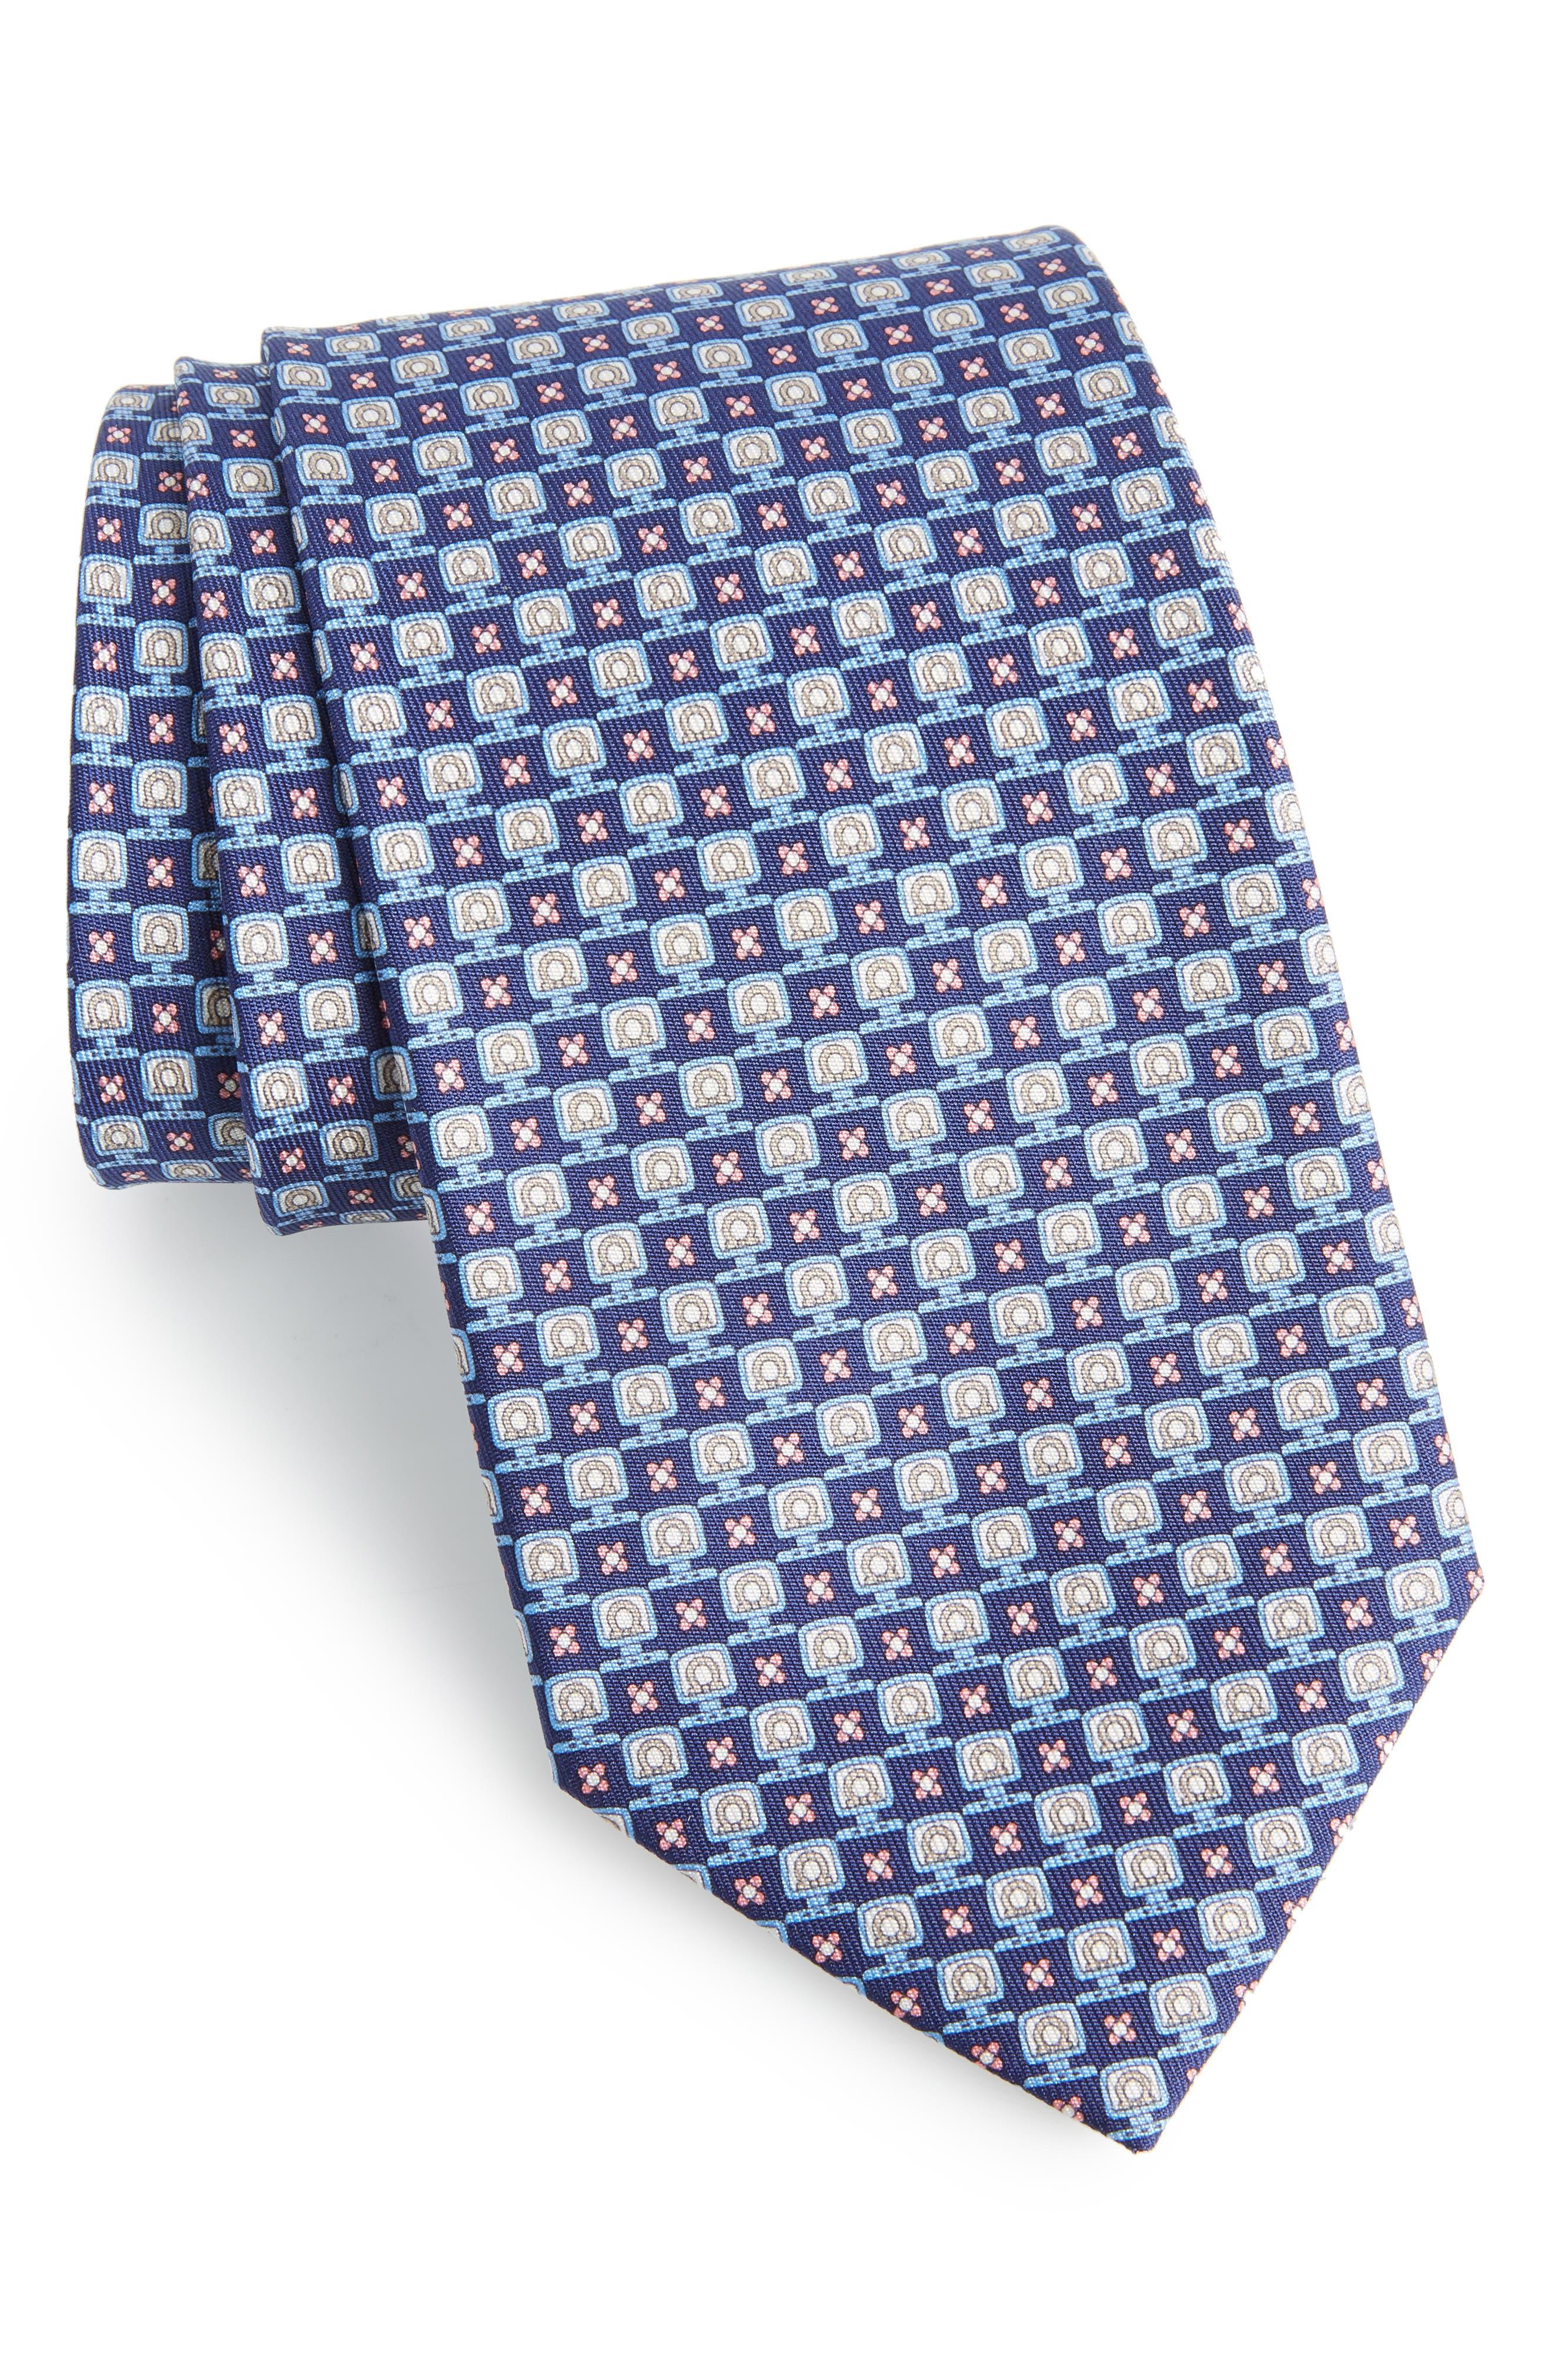 Favola Print Silk Tie,                             Main thumbnail 1, color,                             410